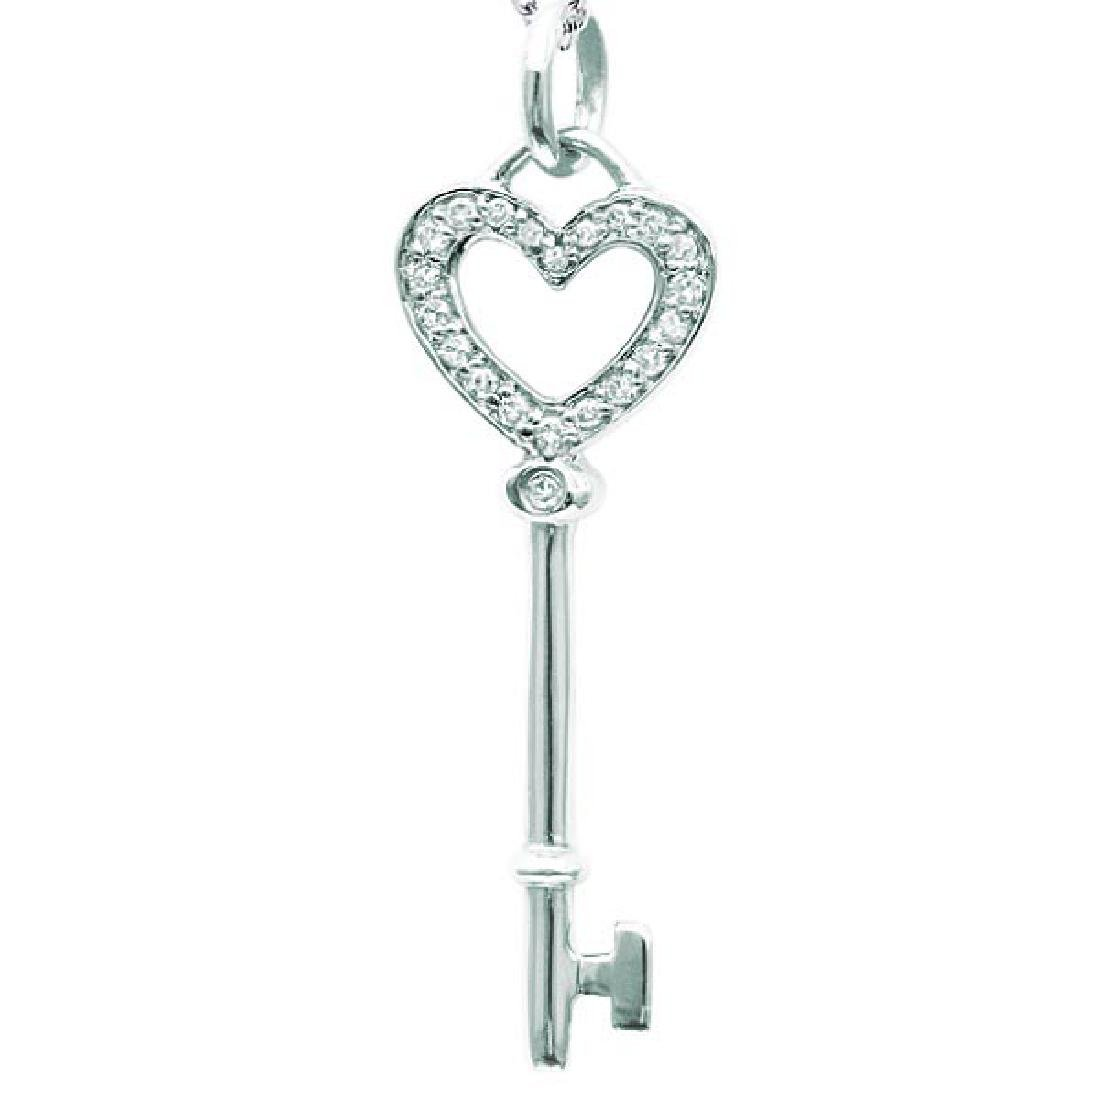 Diamond Heart Key Pendant Necklace in 14k White Gold (0